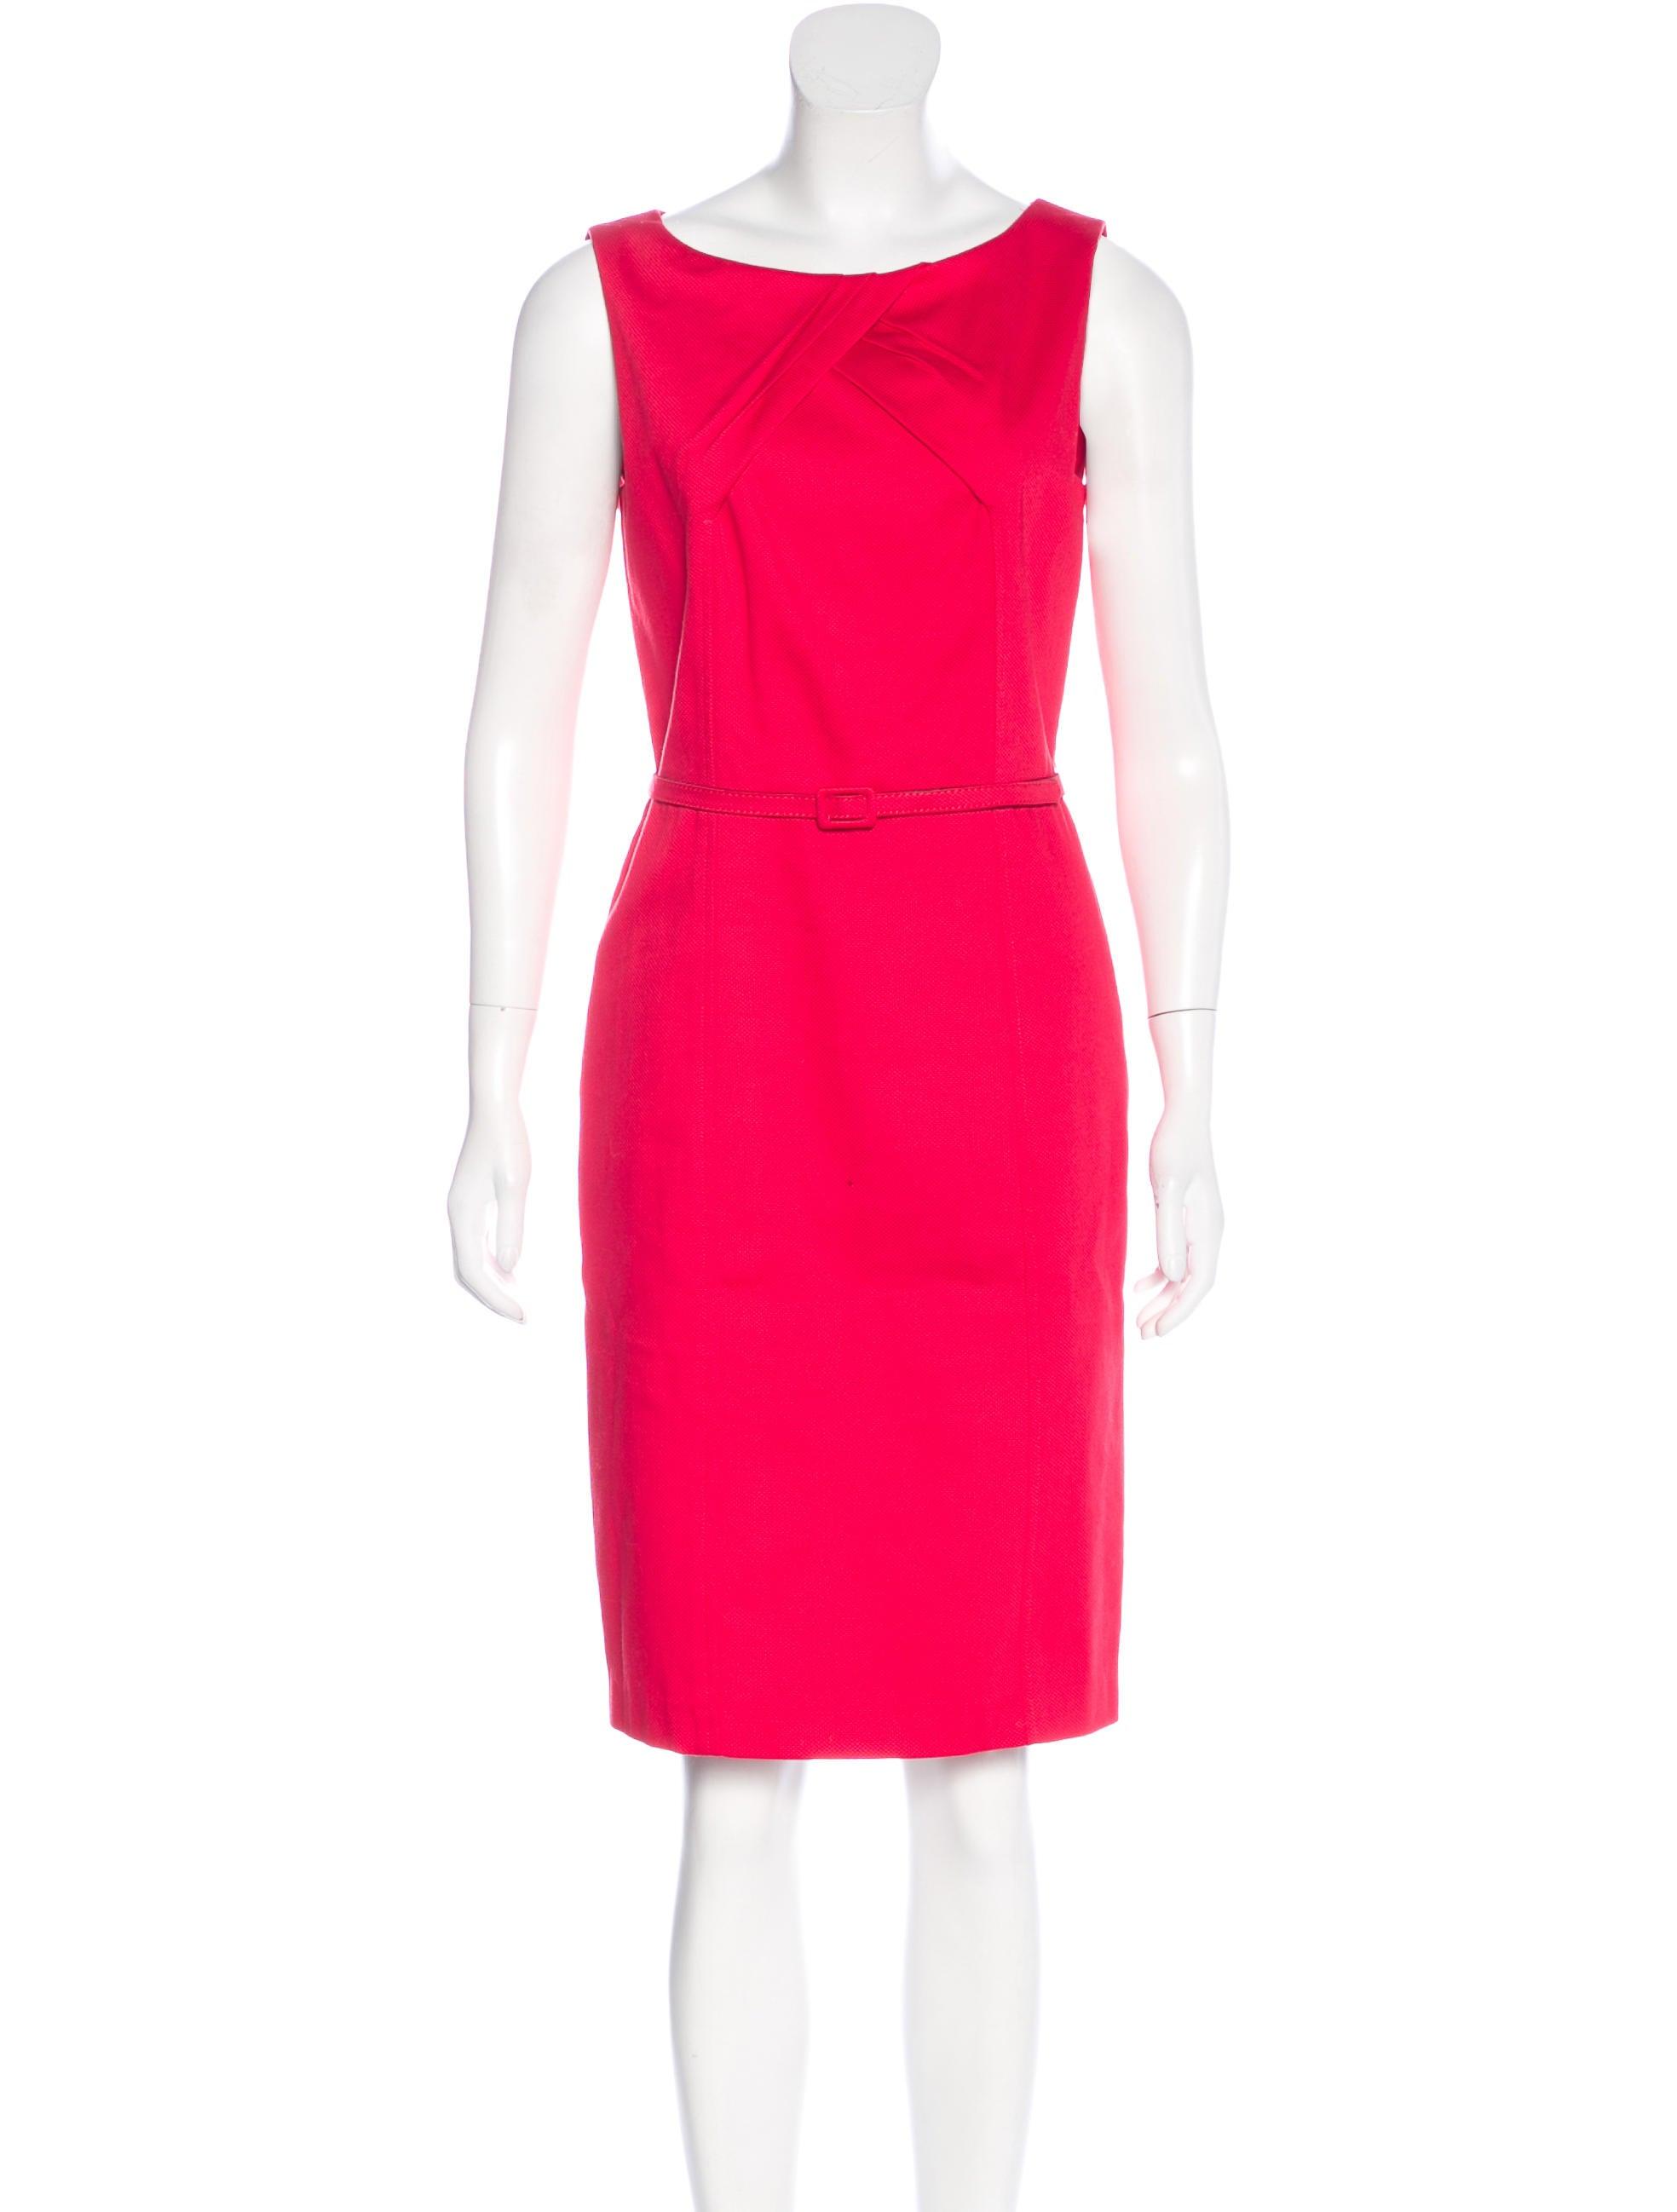 david meister belted sleeveless dress clothing